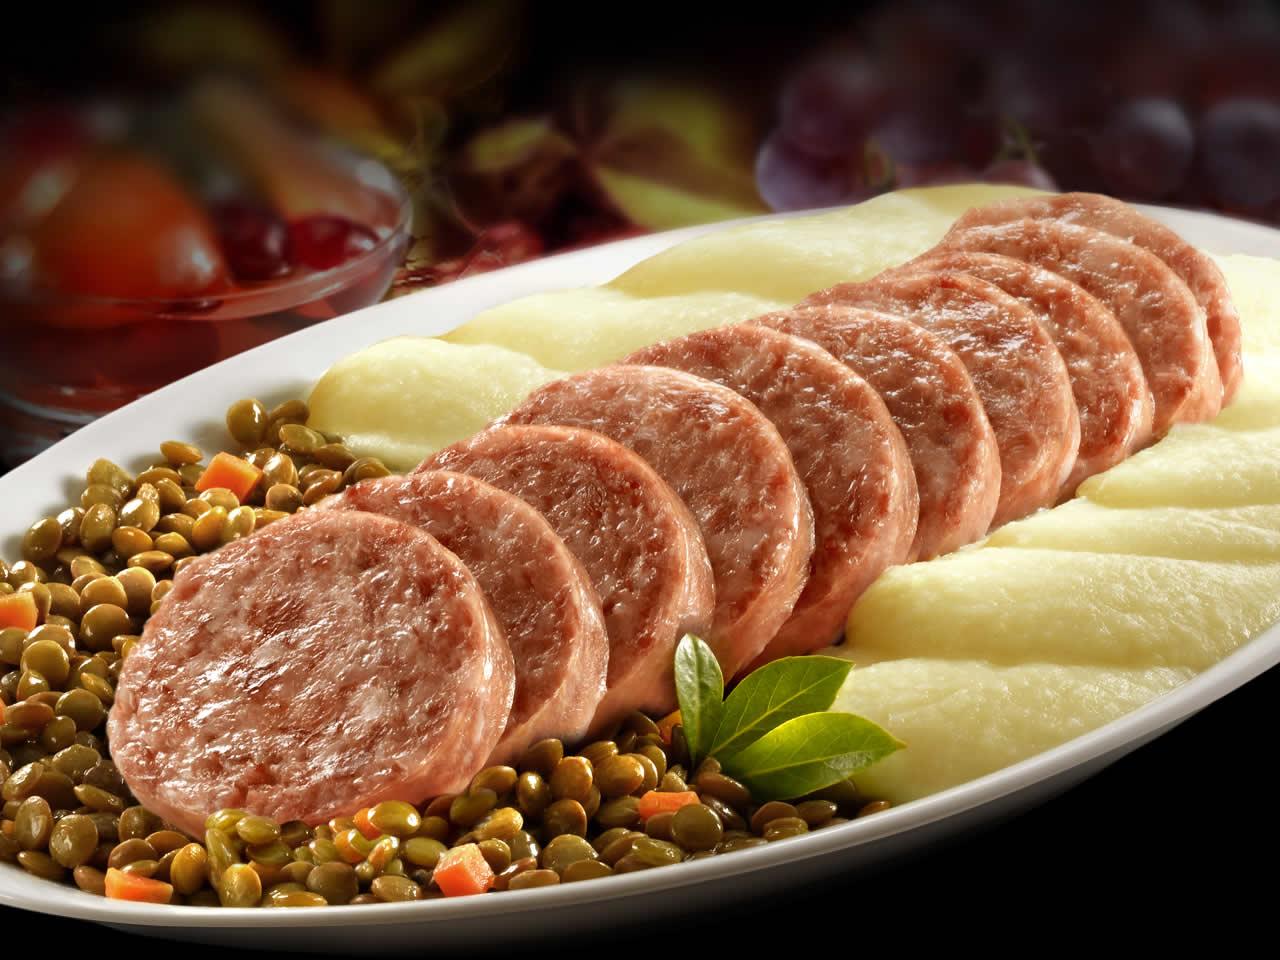 Пряная итальянская колбаса cotechino e lenticchie